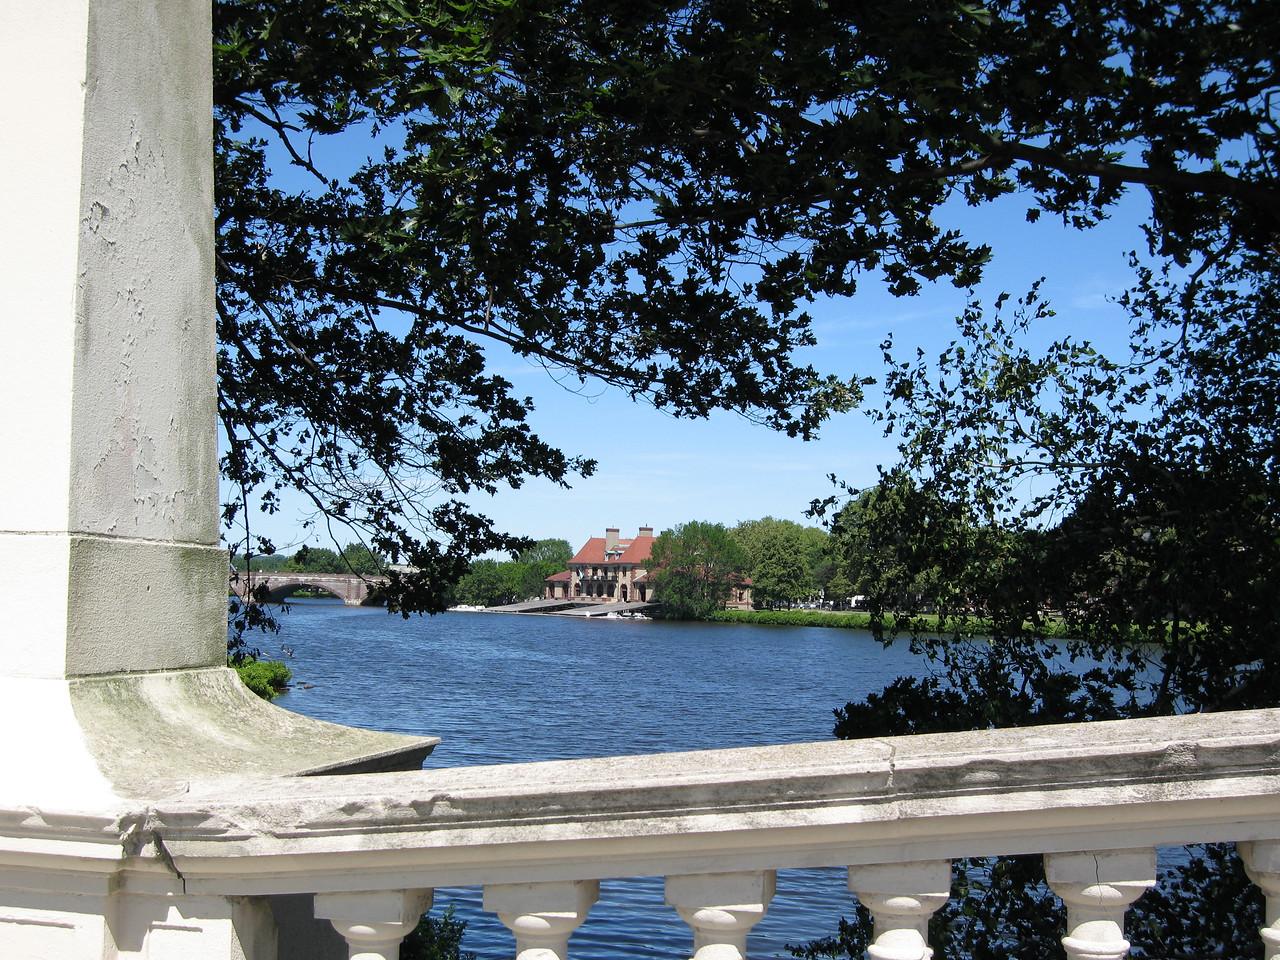 Harvard boat house - Boston, Massachusetts